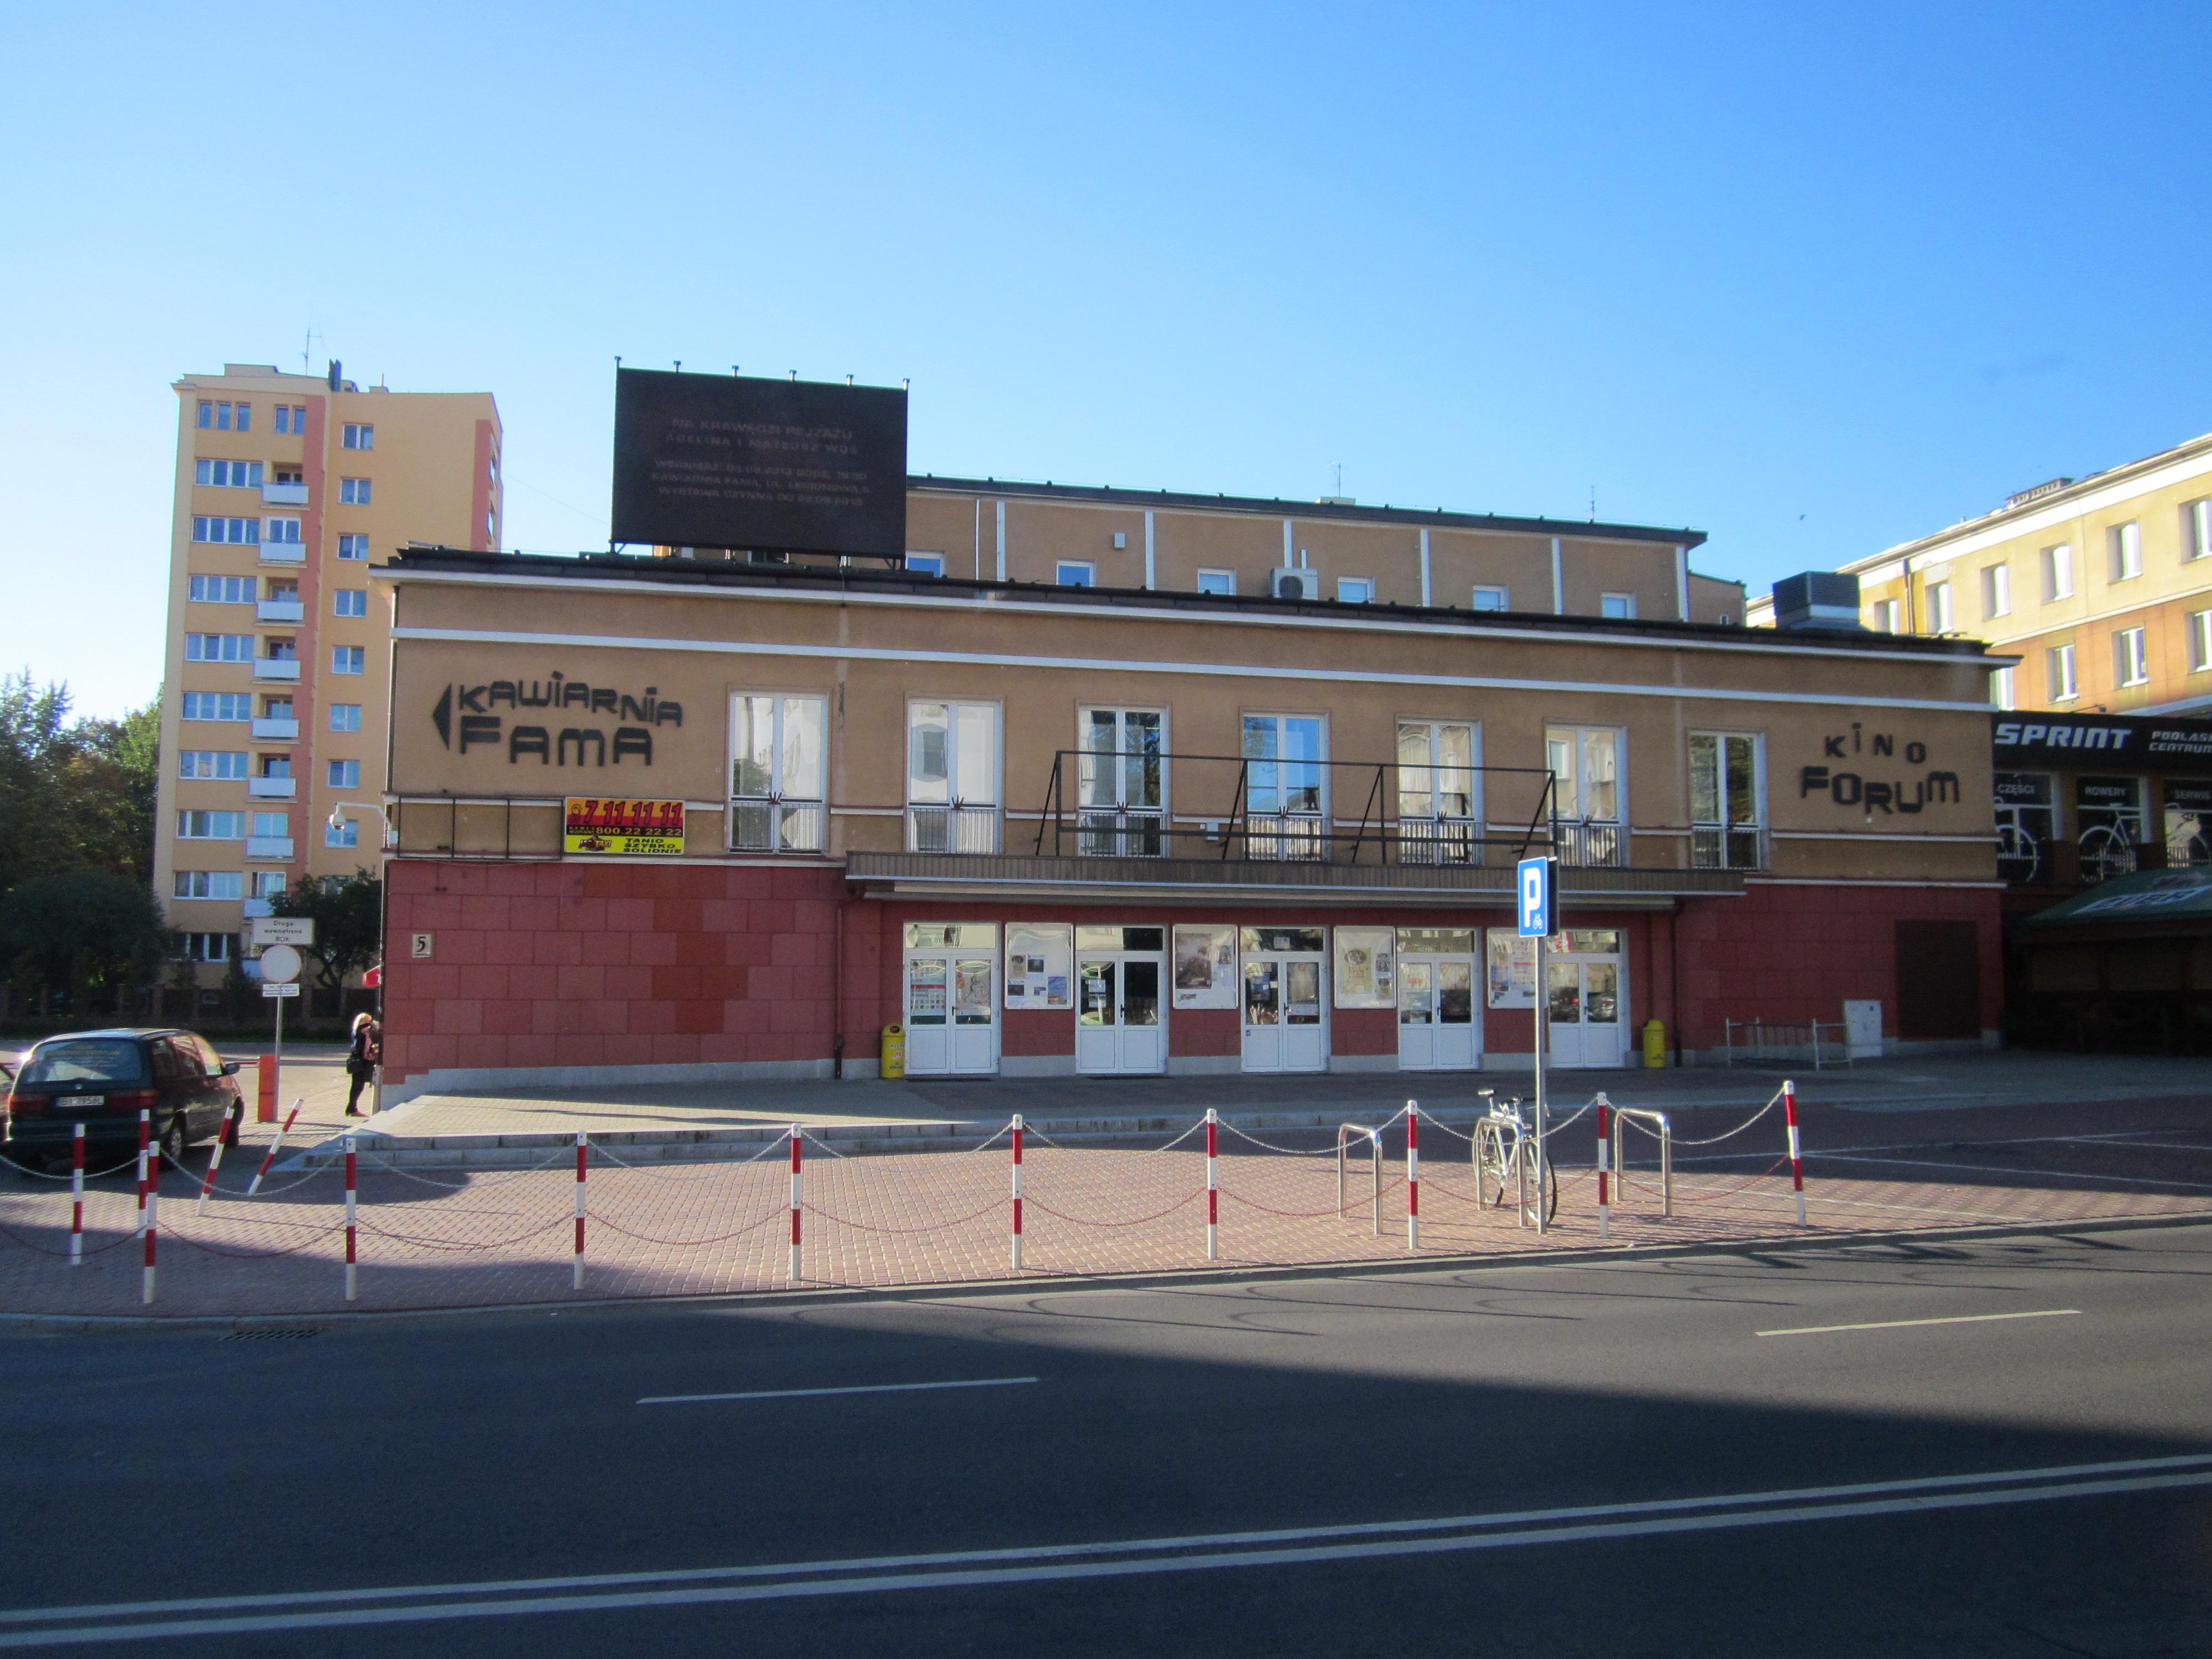 Kino Forum